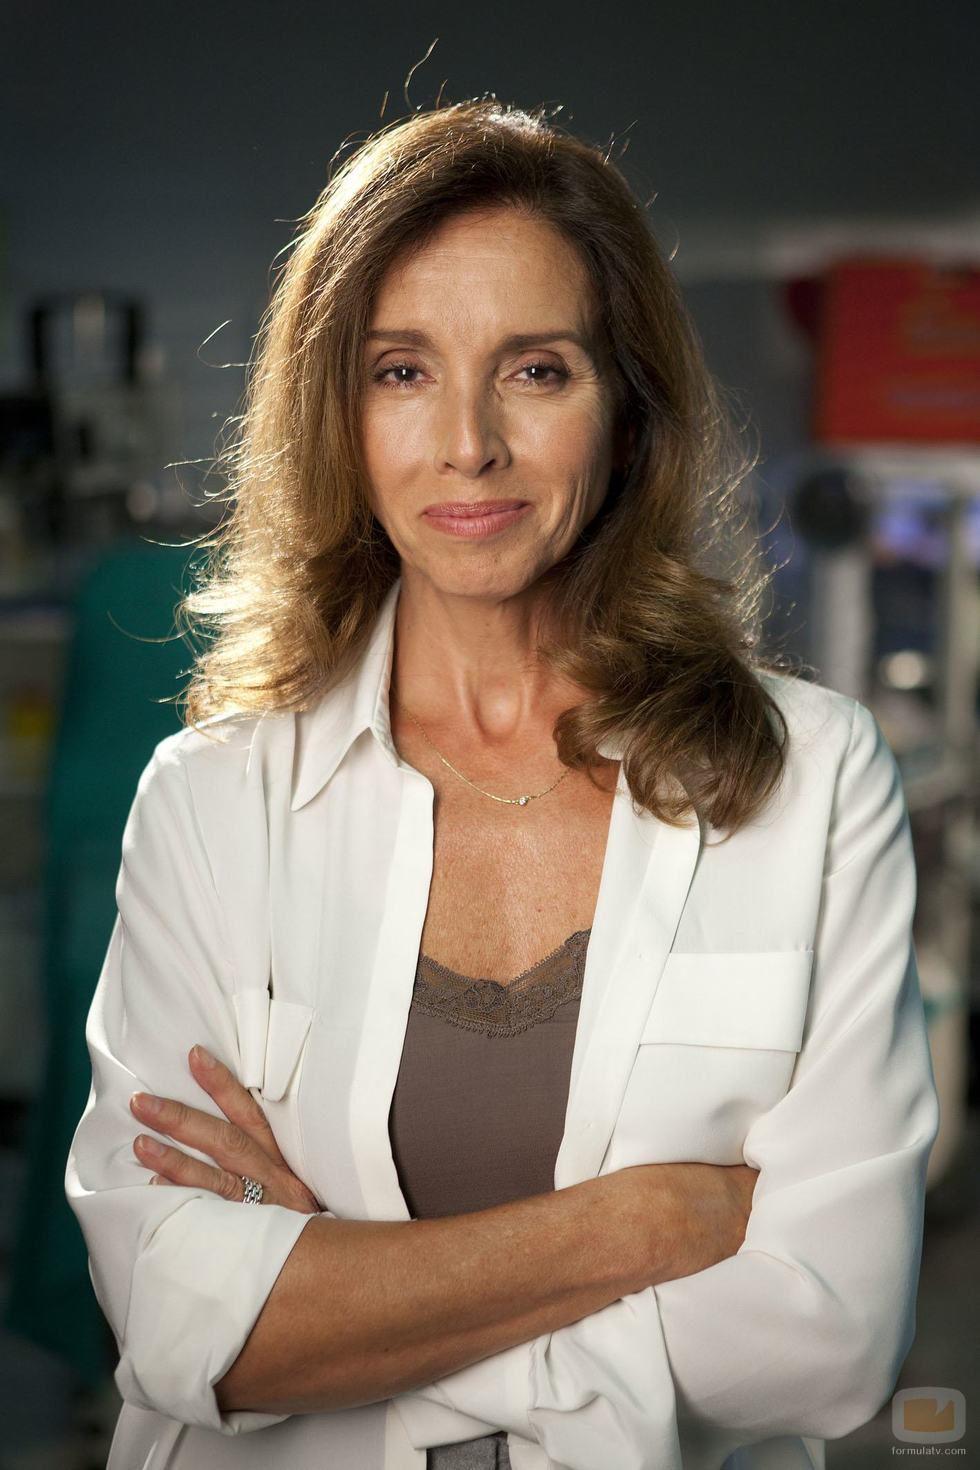 Foto promocional de Ana Belén para la serie 'Hospital Central'